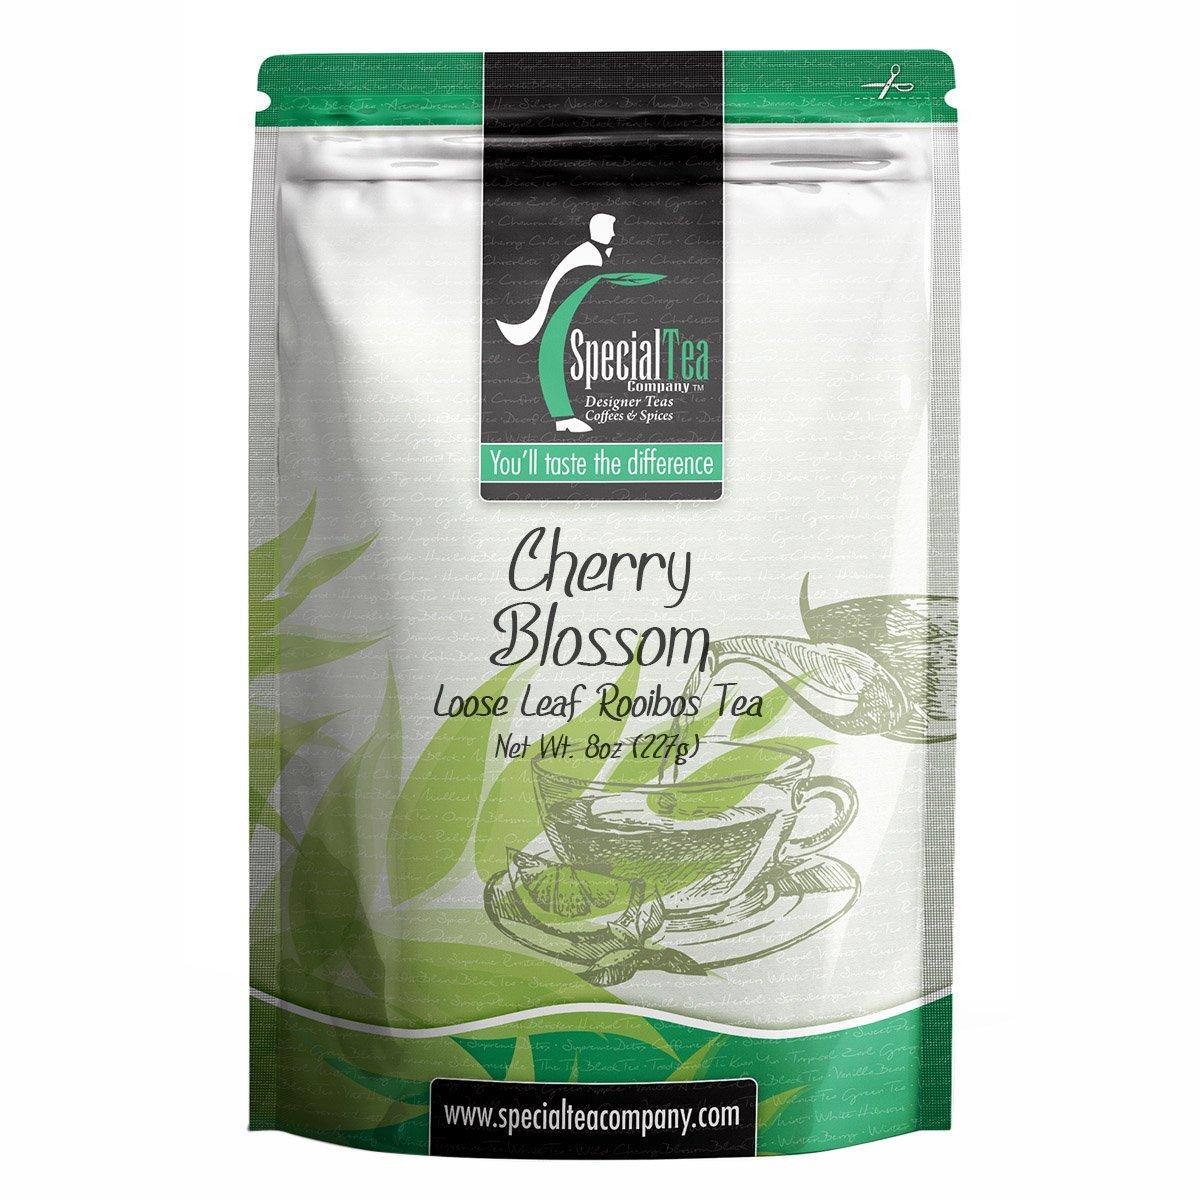 Special Tea Loose Leaf Tea, Cherry Blossom Rooibos, 8 Ounce